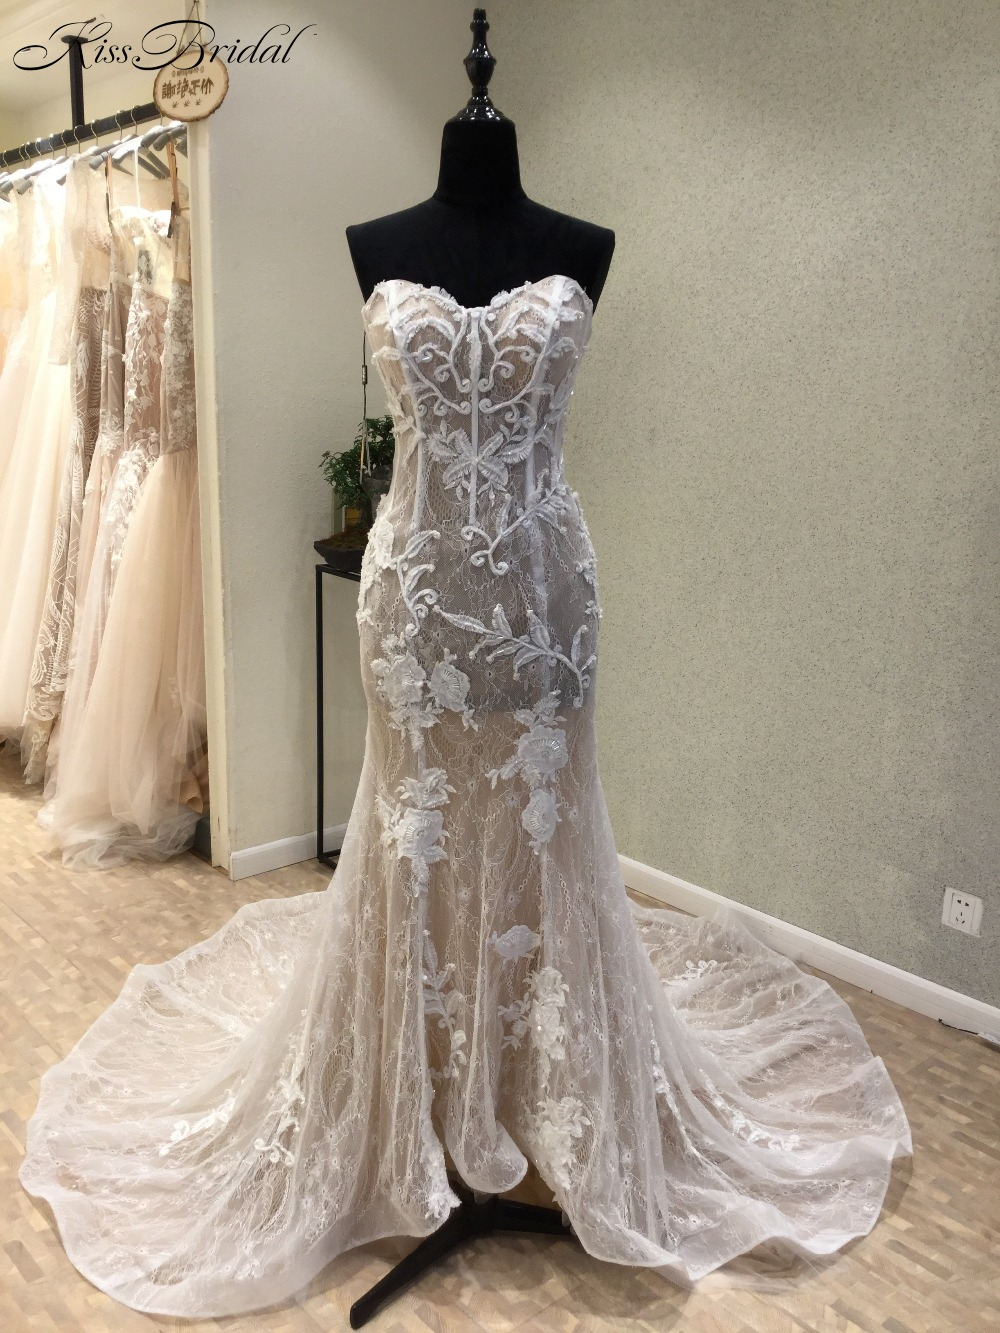 Us 3090 Glormous Appliques Mermaid Wedding Dresses 2018 Sweetheart Lace Corset Dress For Bride Vestido De Noiva In Wedding Dresses From Weddings